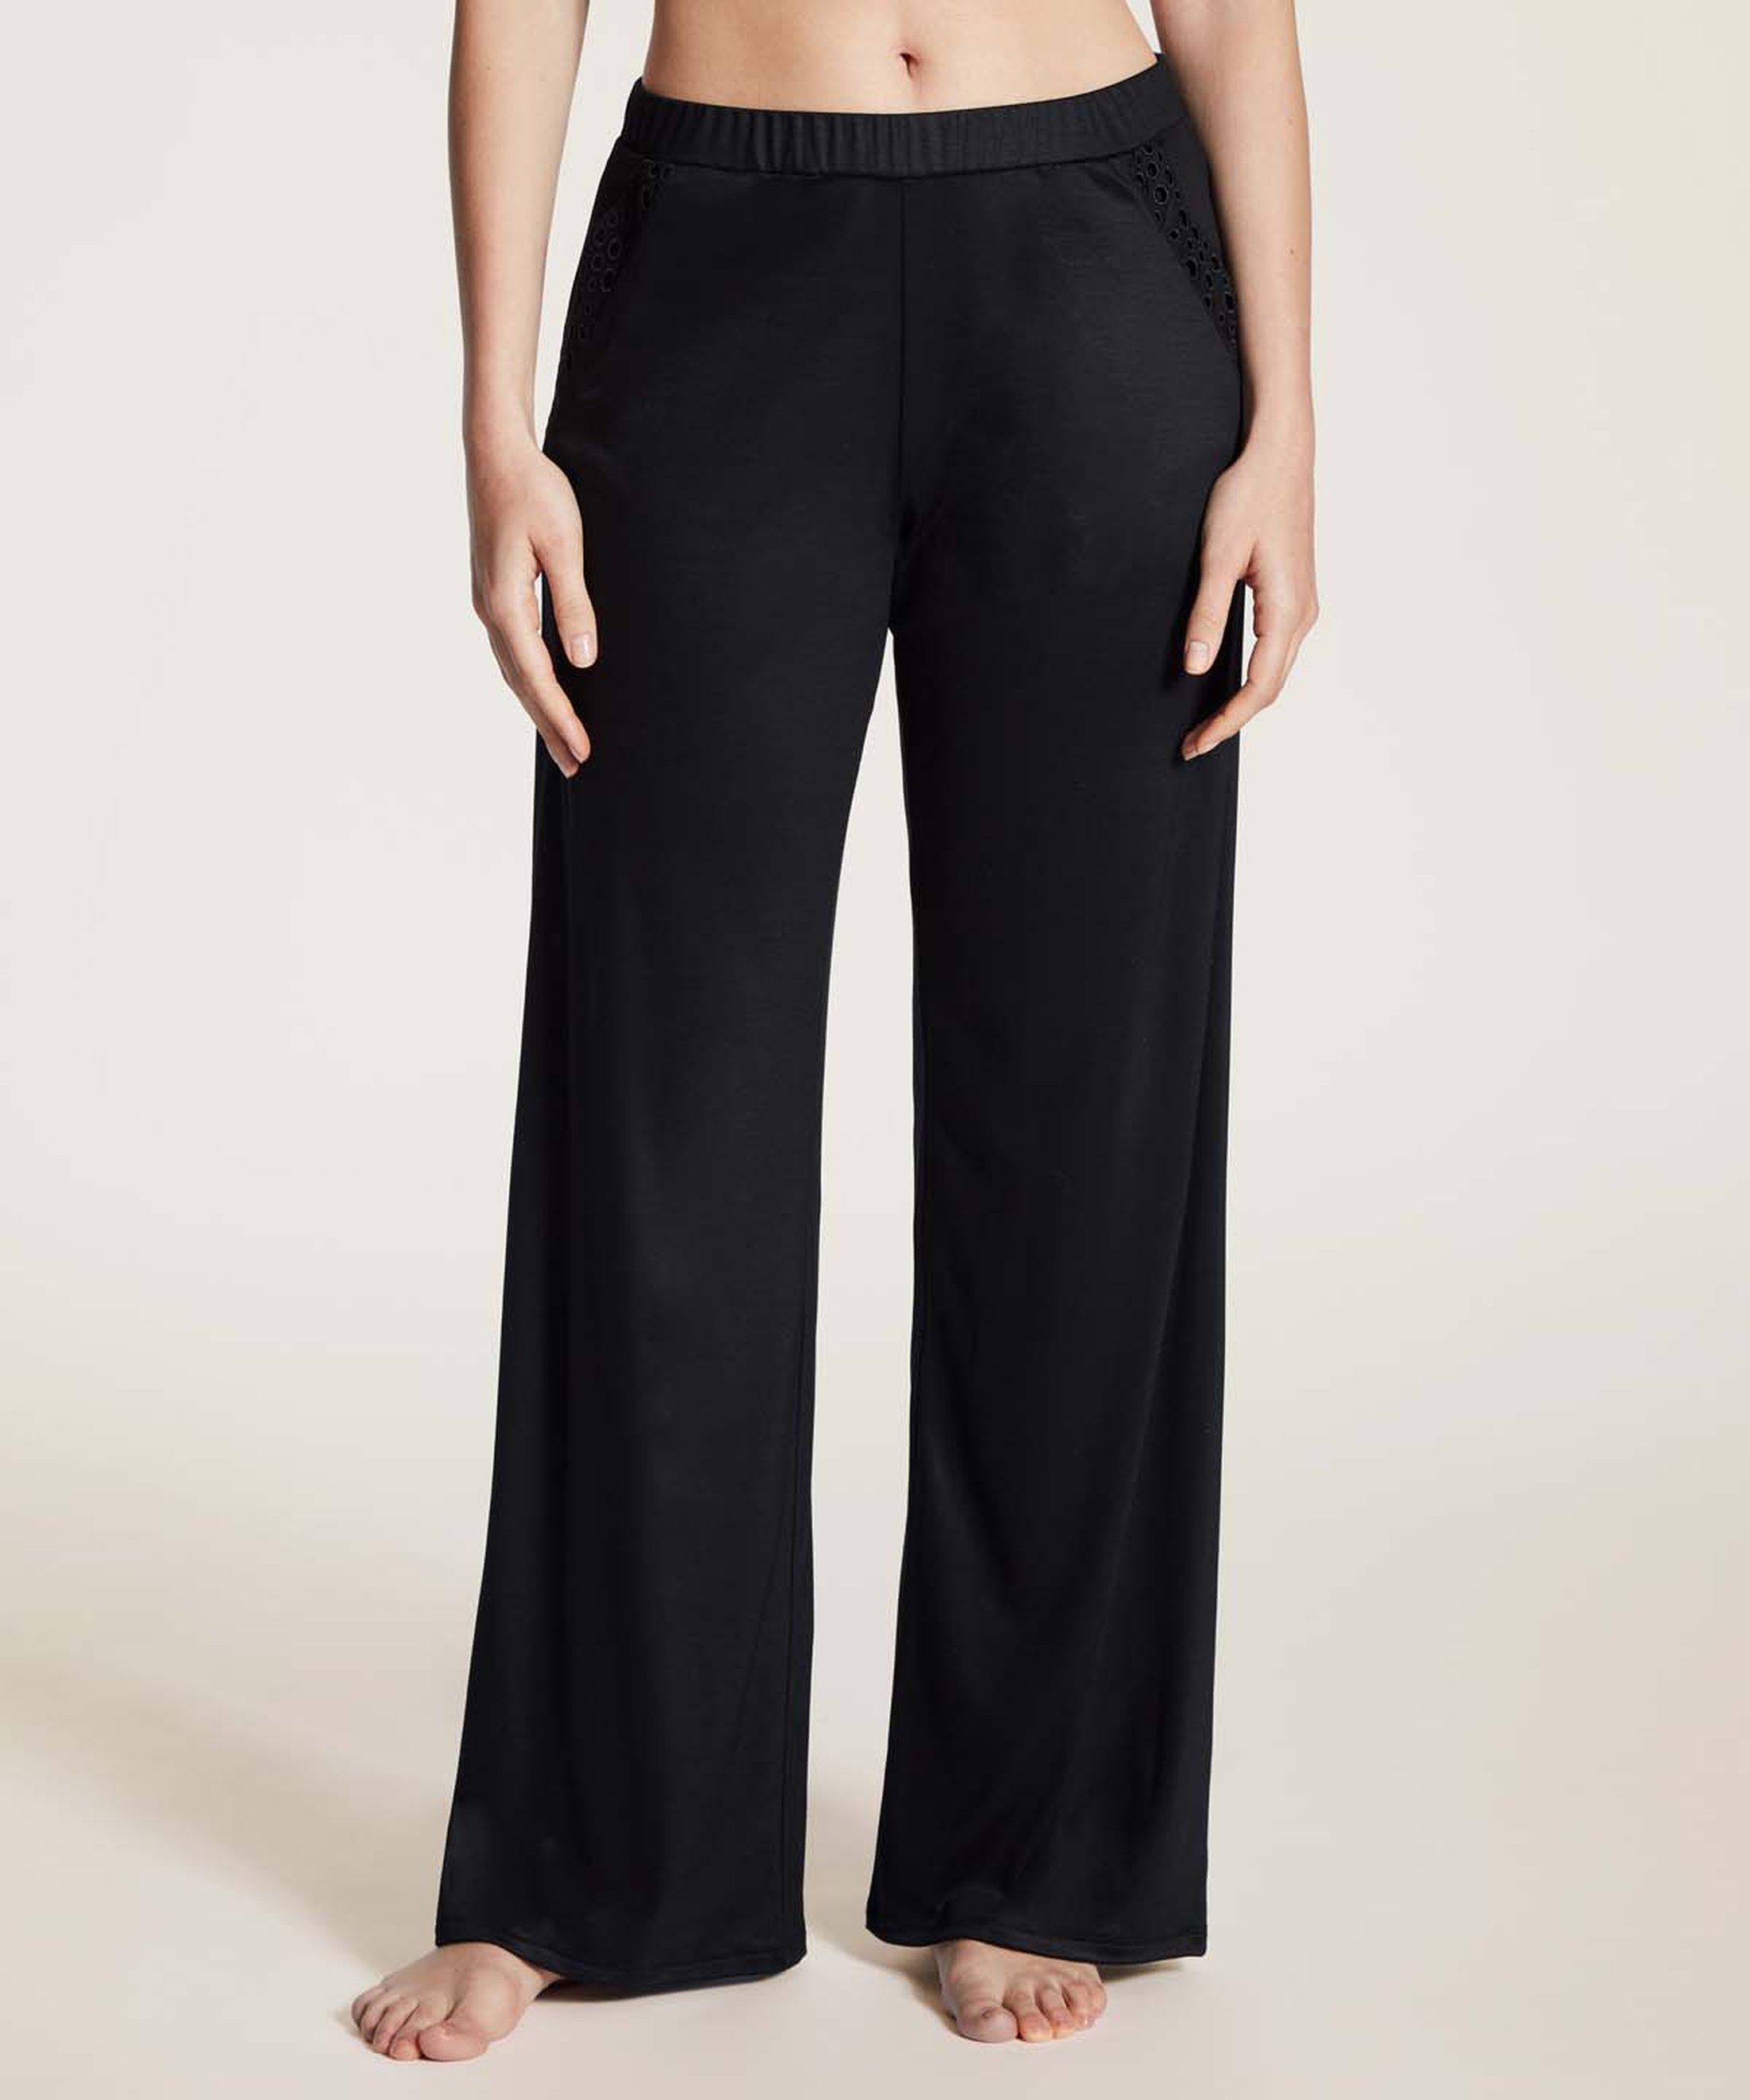 BULLE DE DOUCEUR Pantalon en Tencel Noir | Aubade